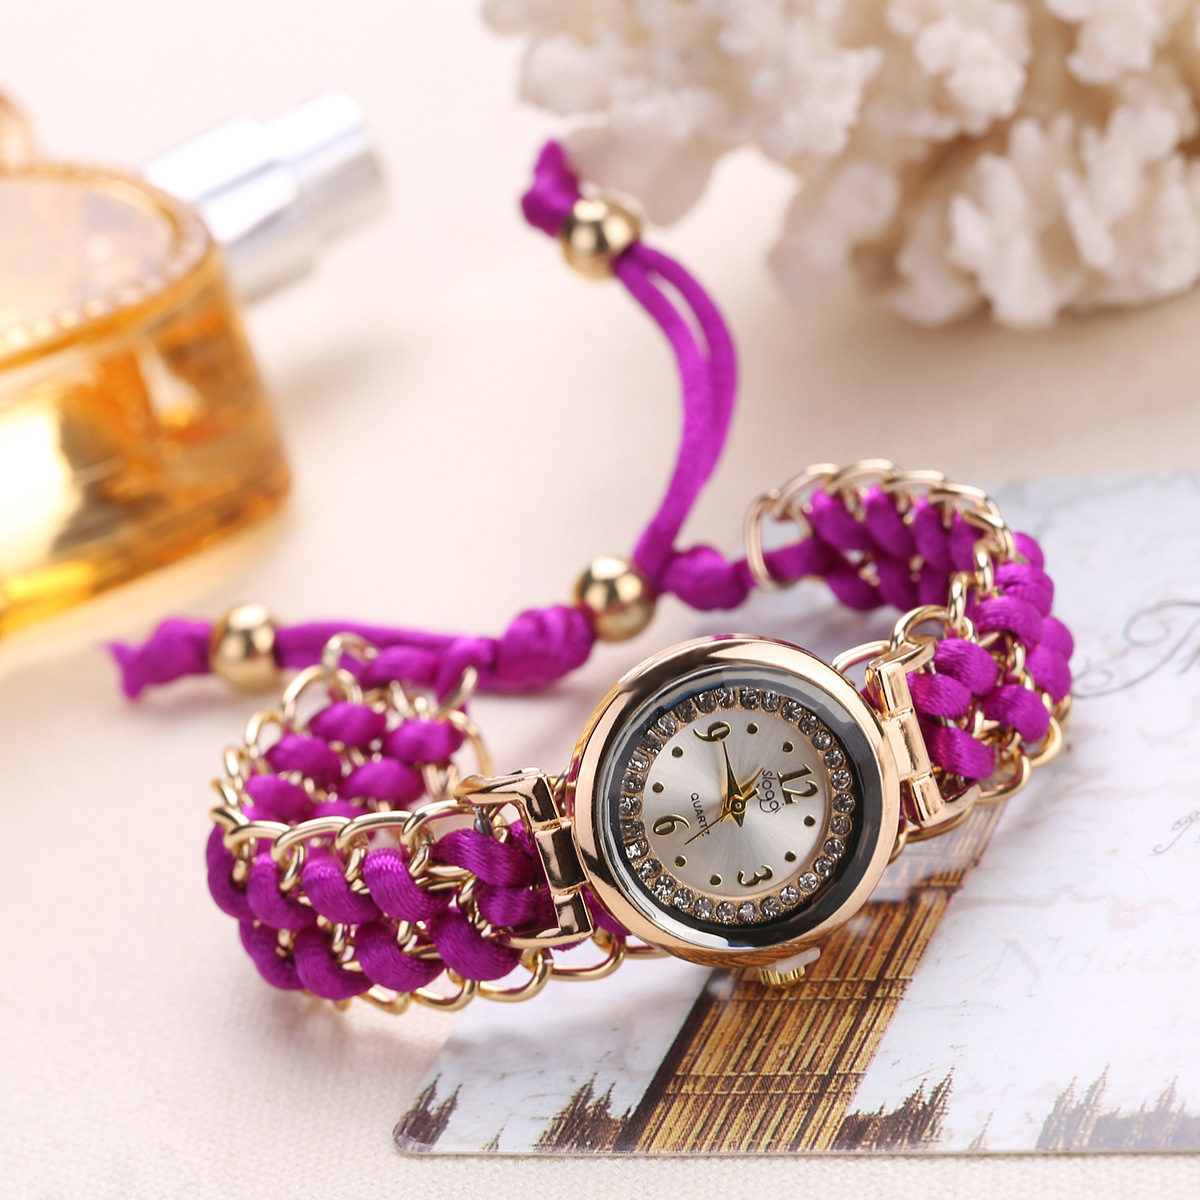 fashion   Watch (Light brown)  NHHK0776-Light brown